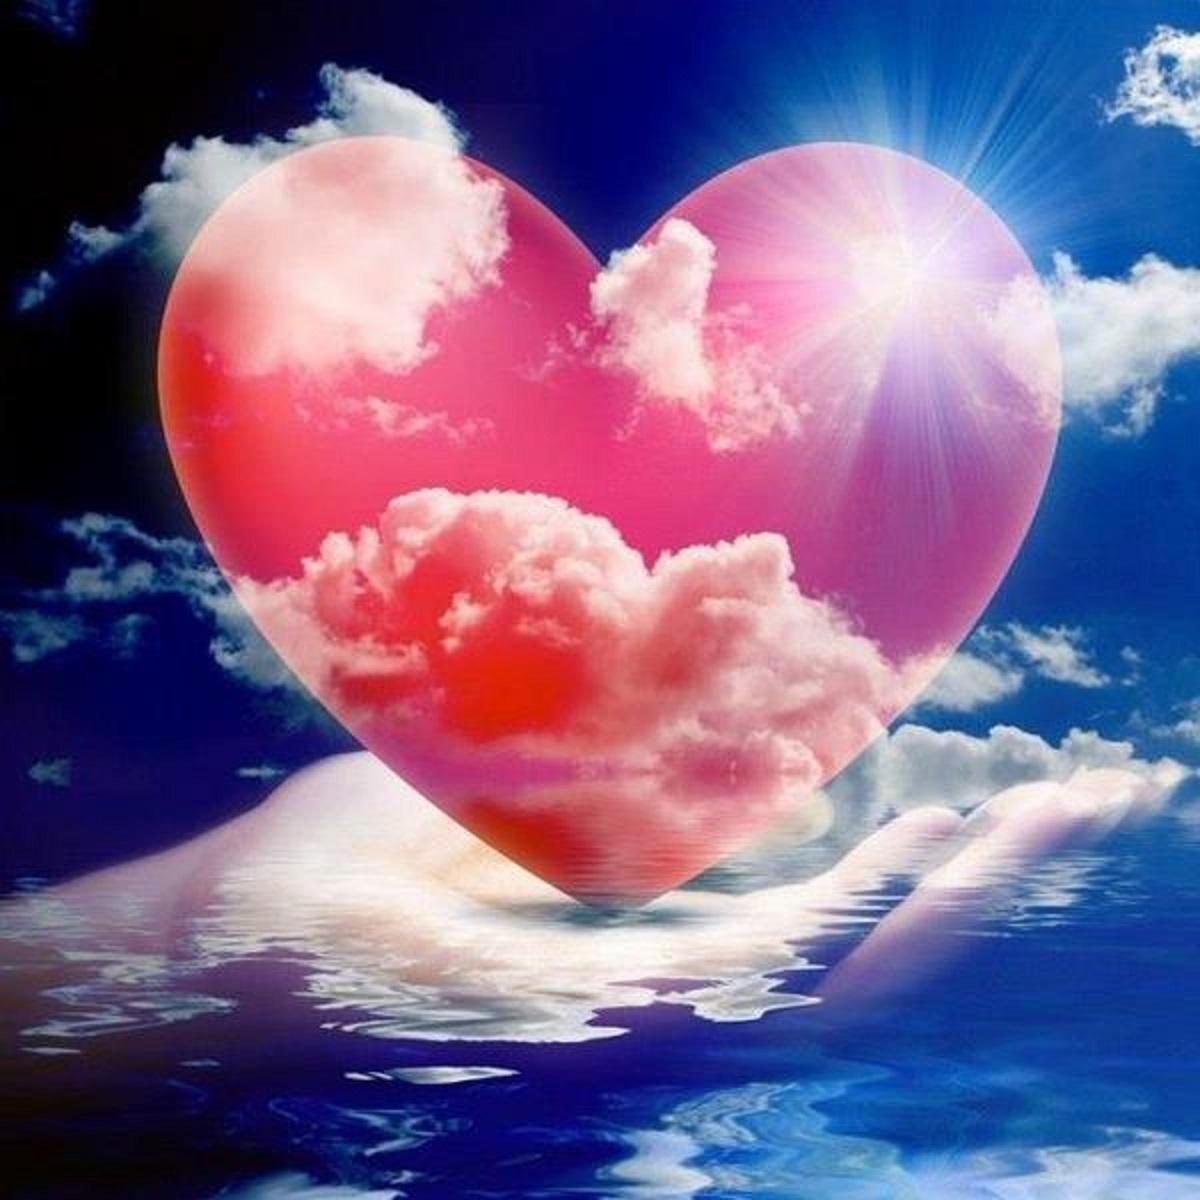 http://s02.yapfiles.ru/files/679206/I_LOVE_YOU4_Edited.jpg